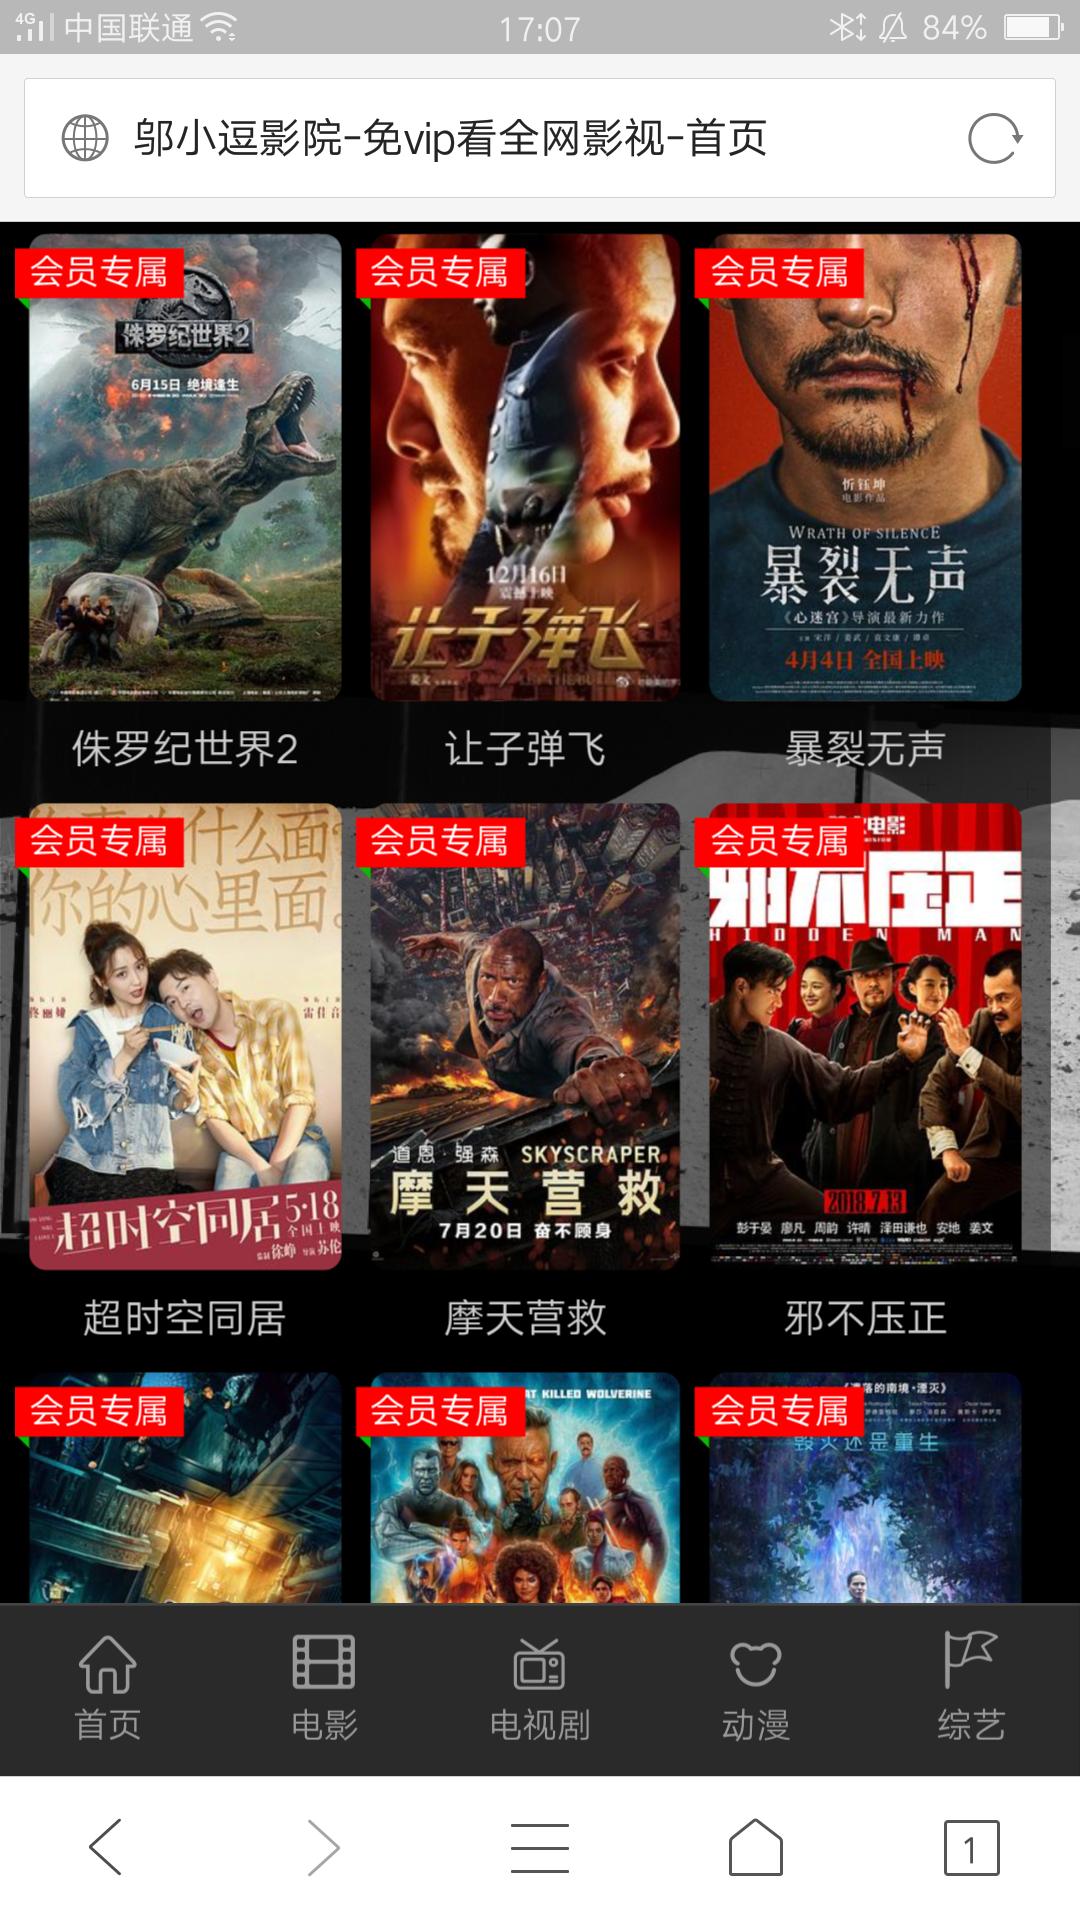 freekan4.0邬小逗修复更新版源码